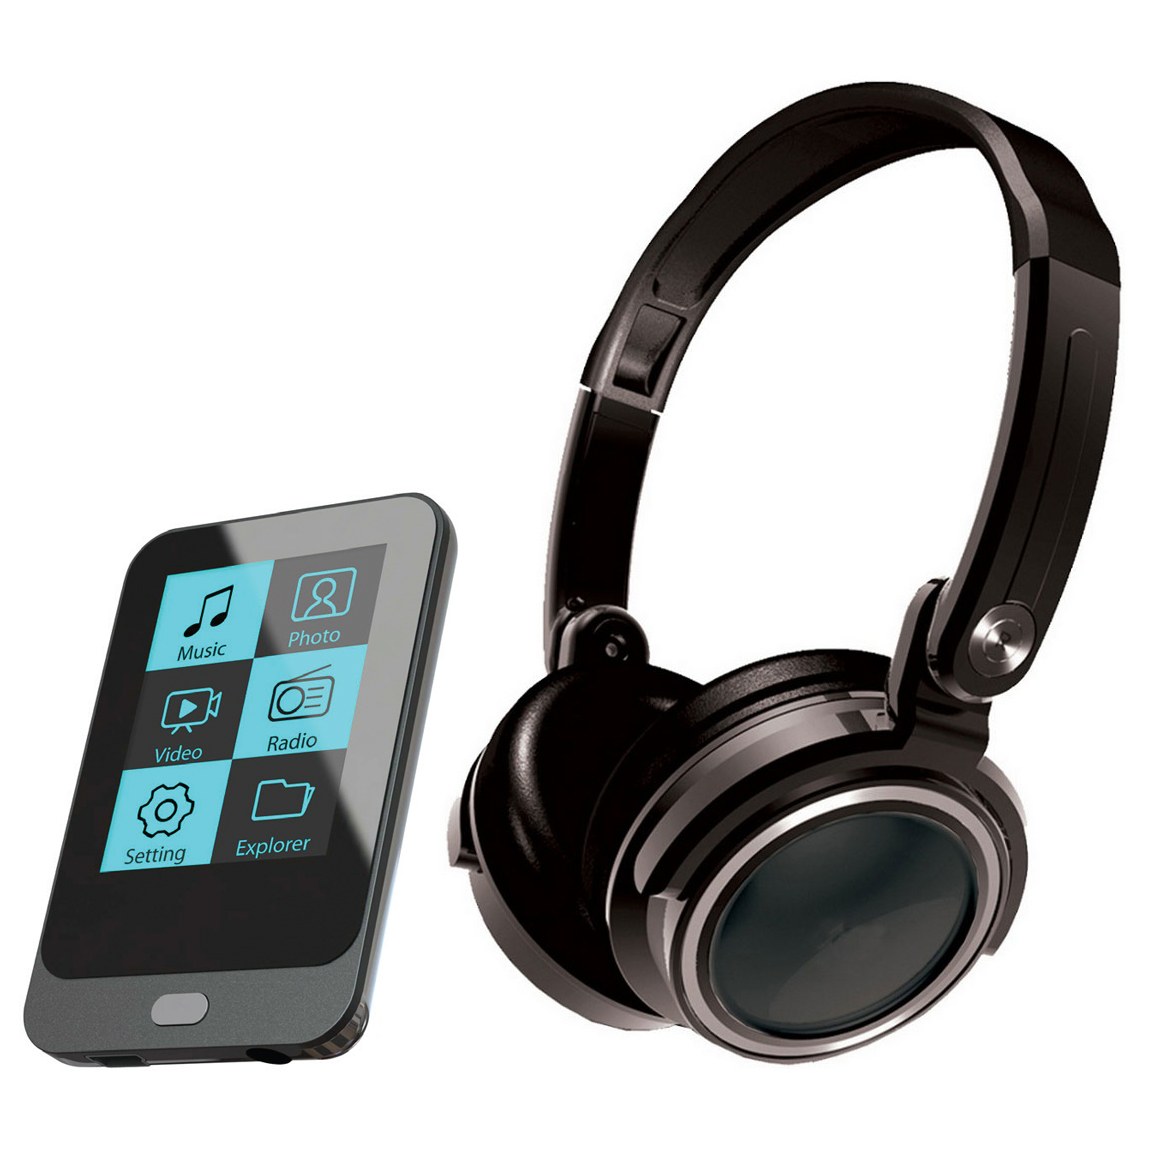 mpman ts200 4 go casque lecteur mp3 ipod mp man sur. Black Bedroom Furniture Sets. Home Design Ideas